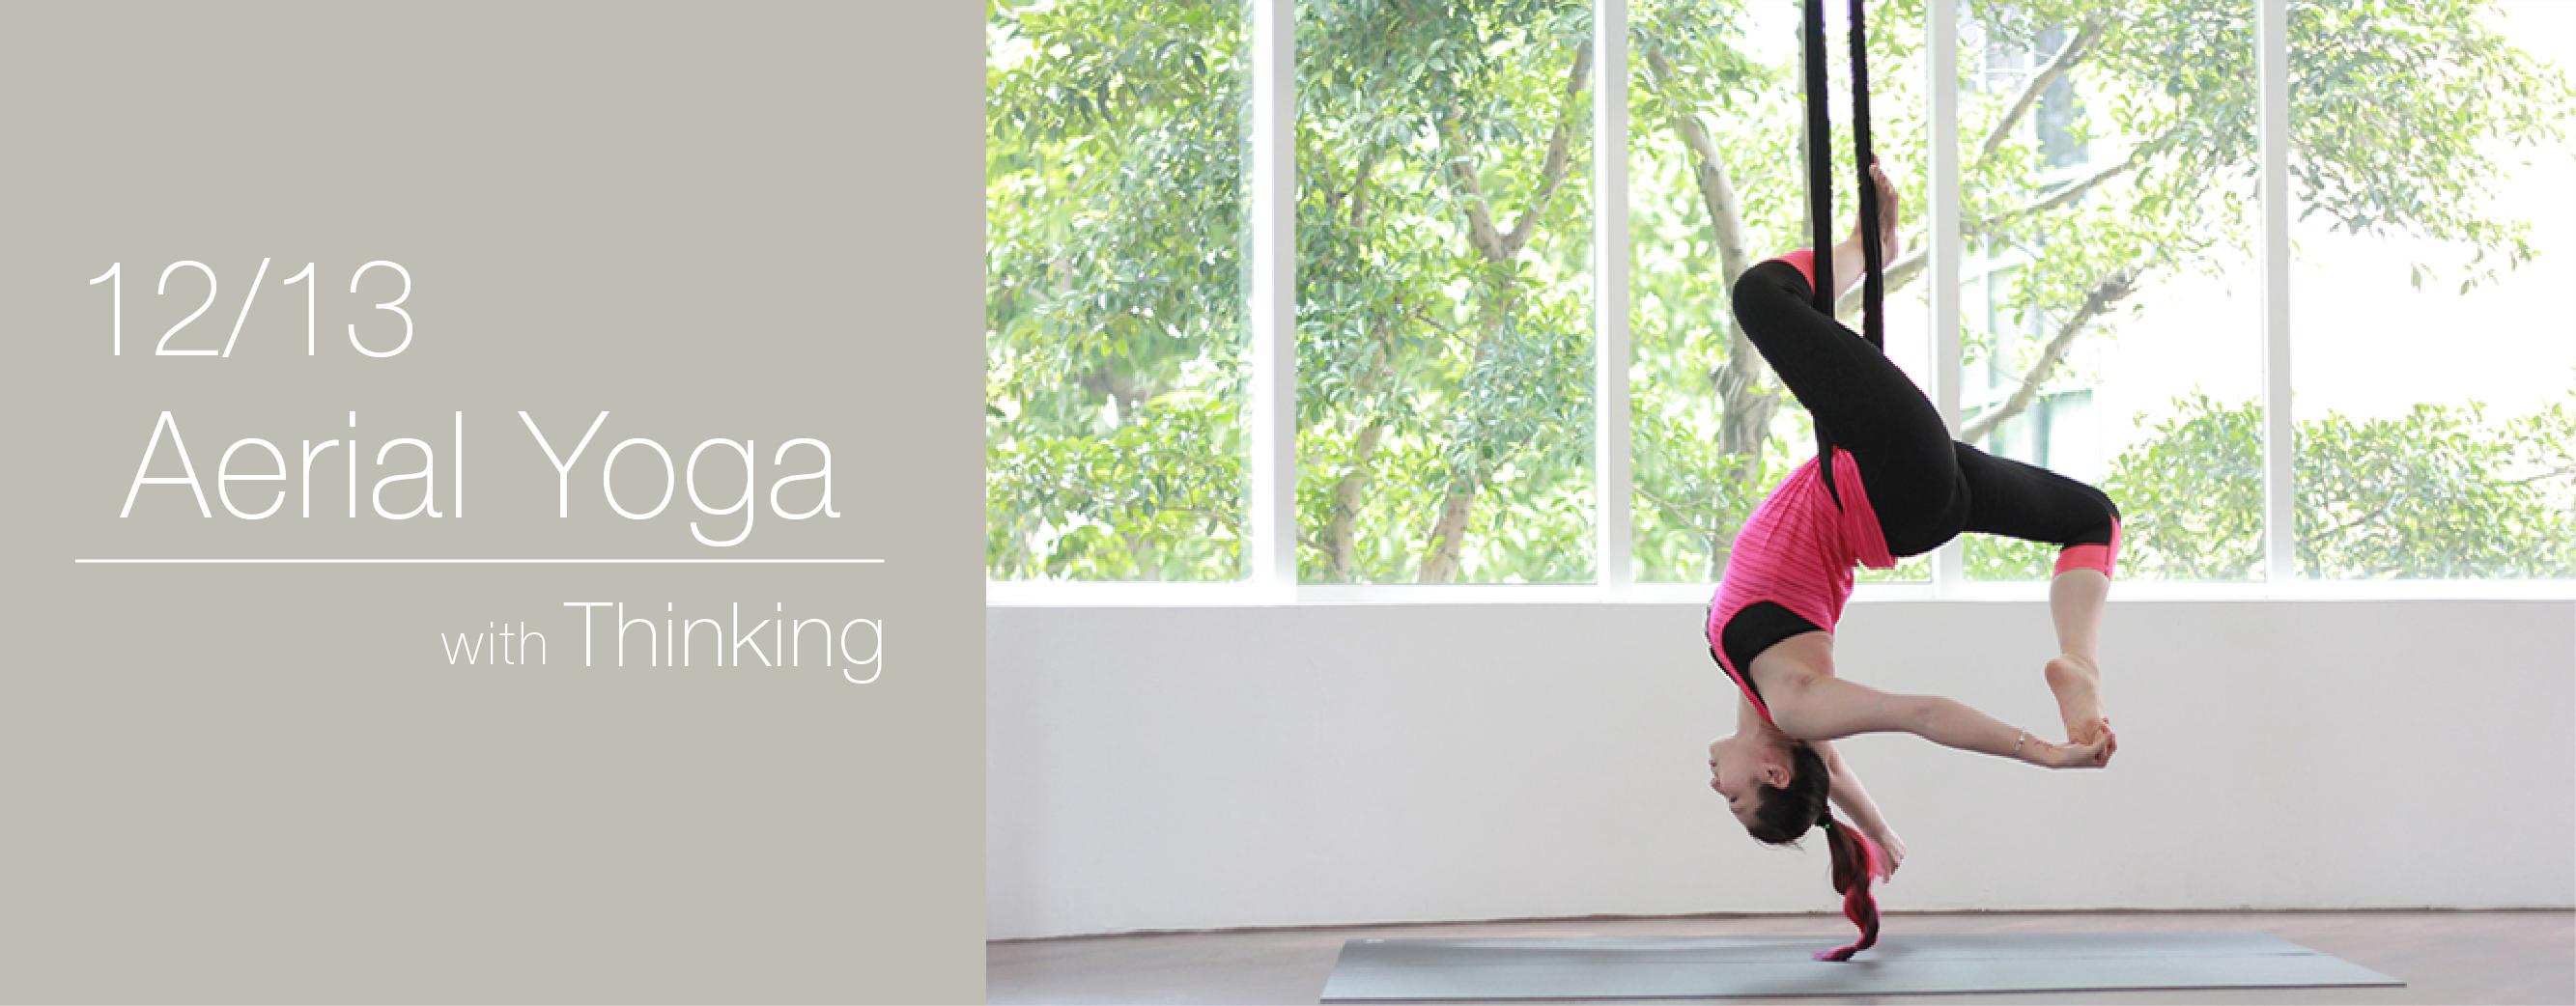 1213 AERIAL yoga